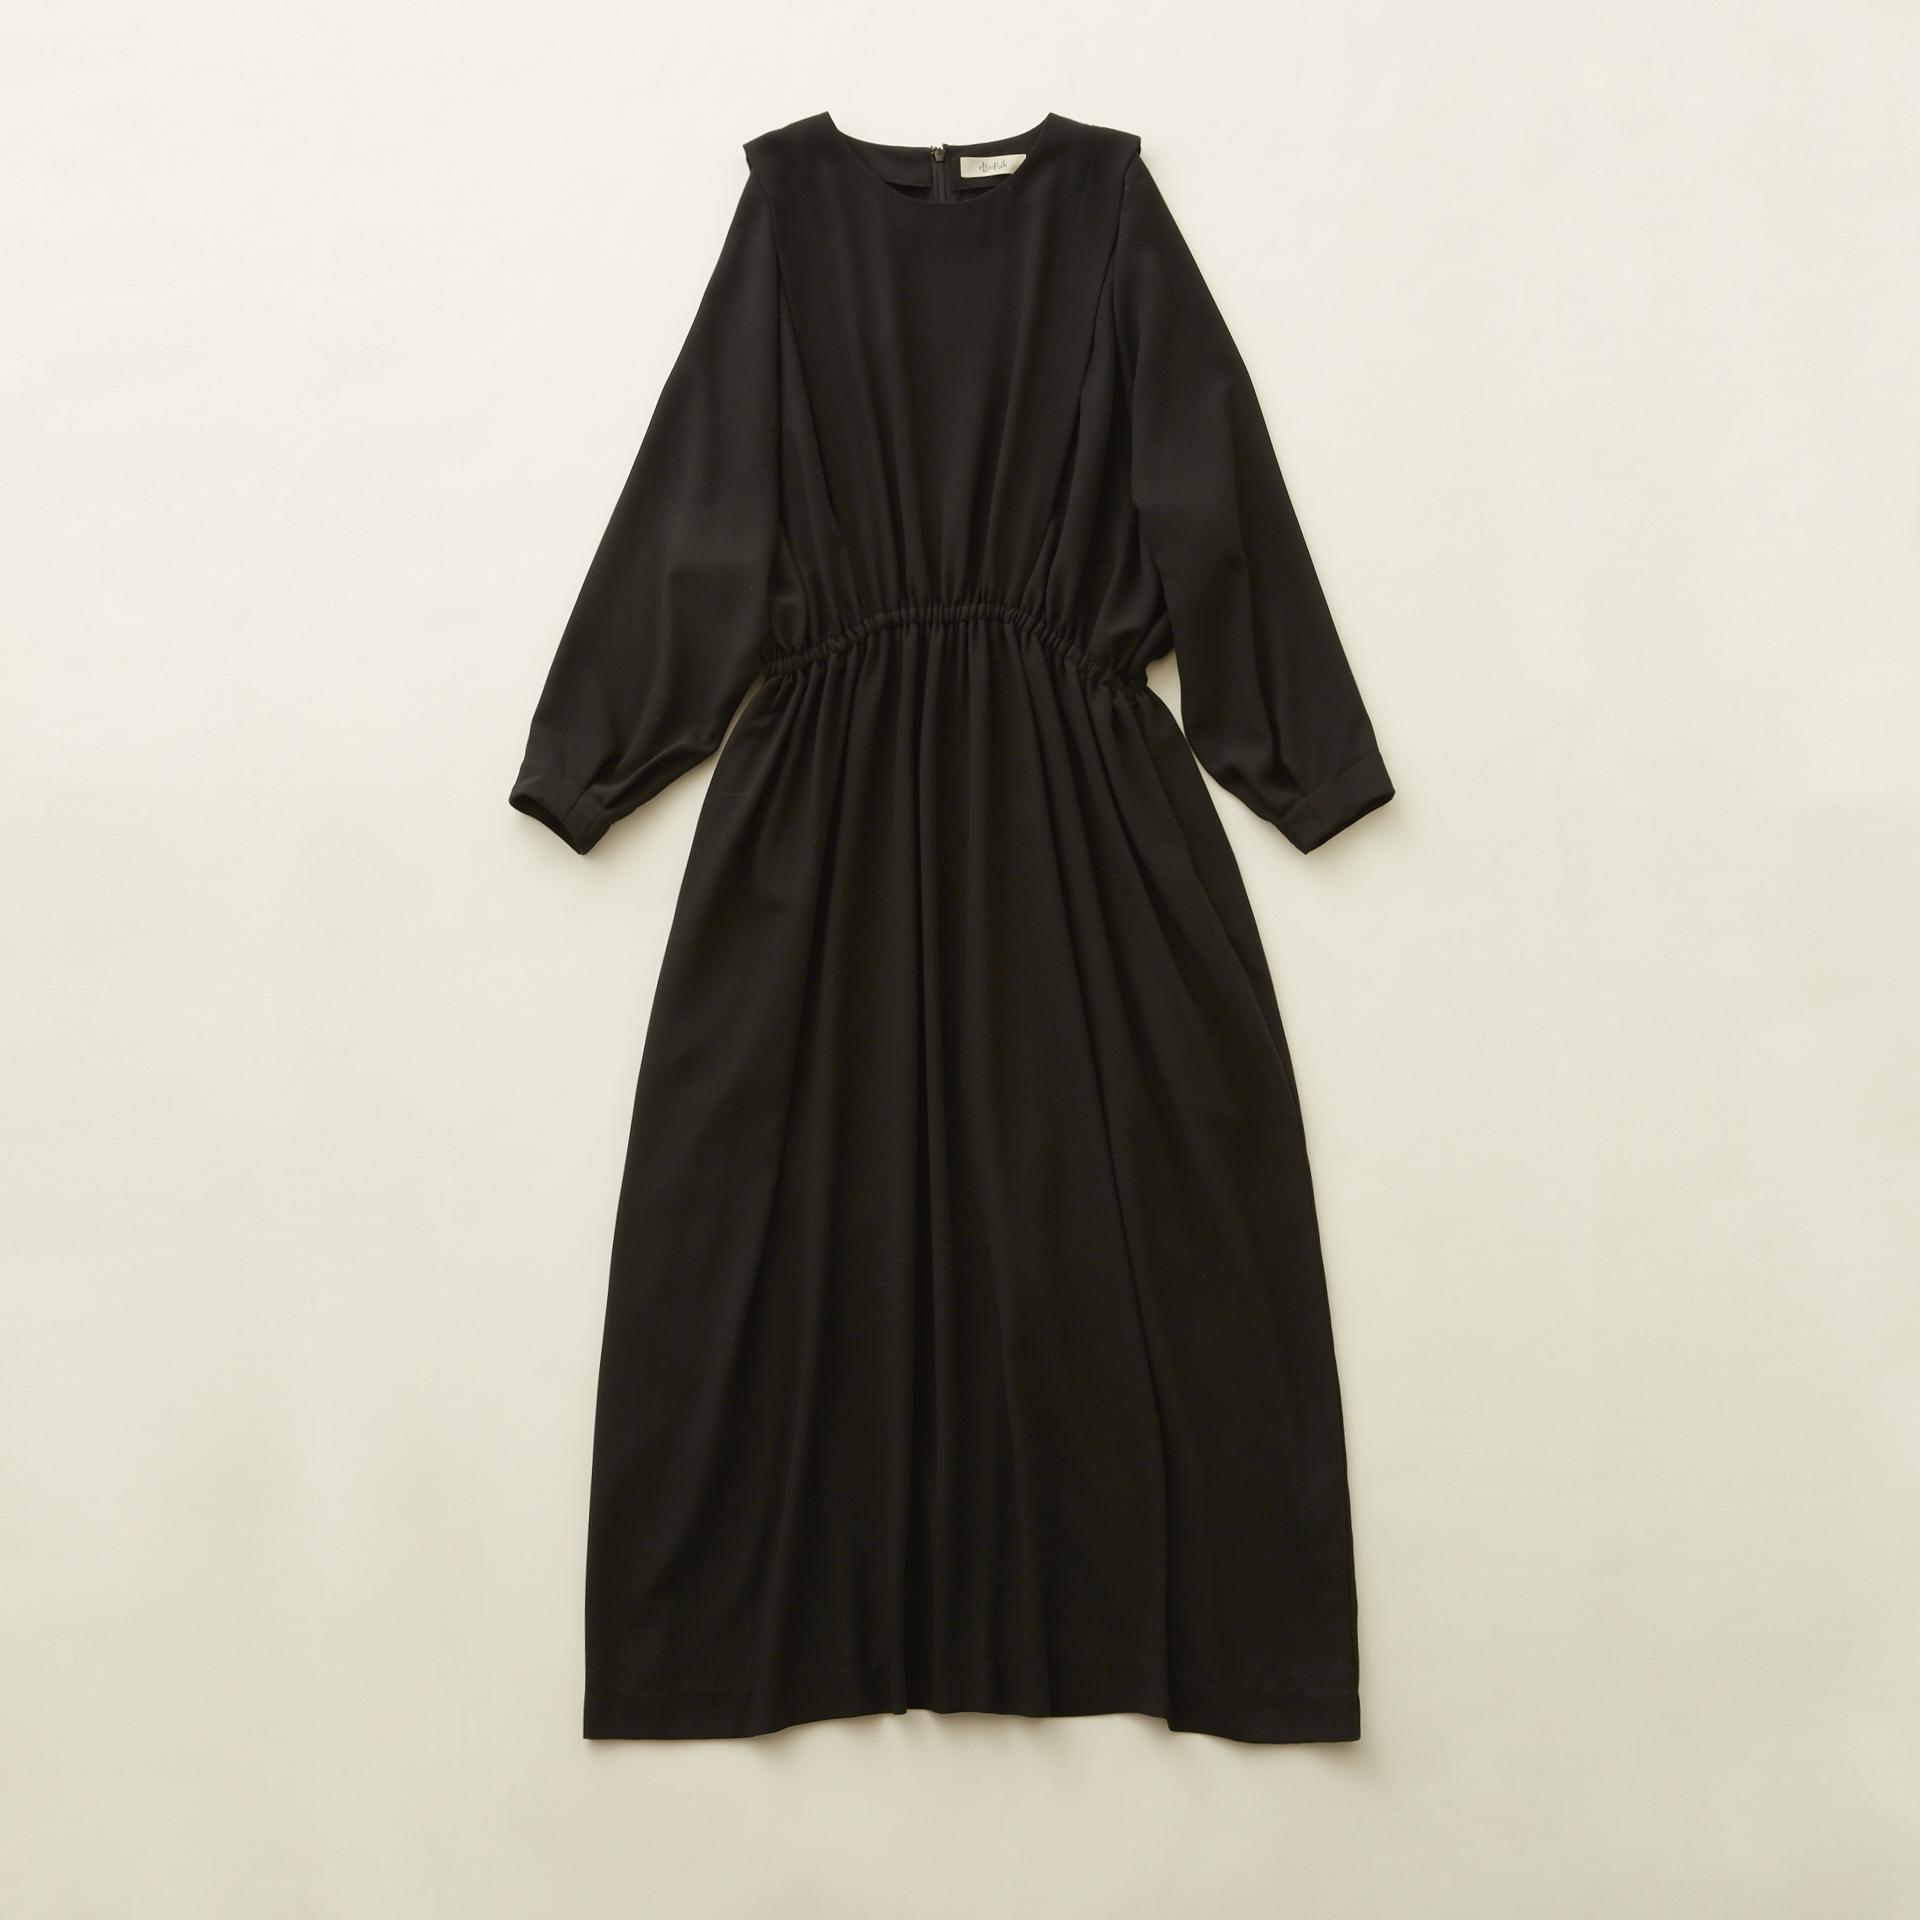 《eLfinFolk 2020AW》witch long dress / black / S(大人)